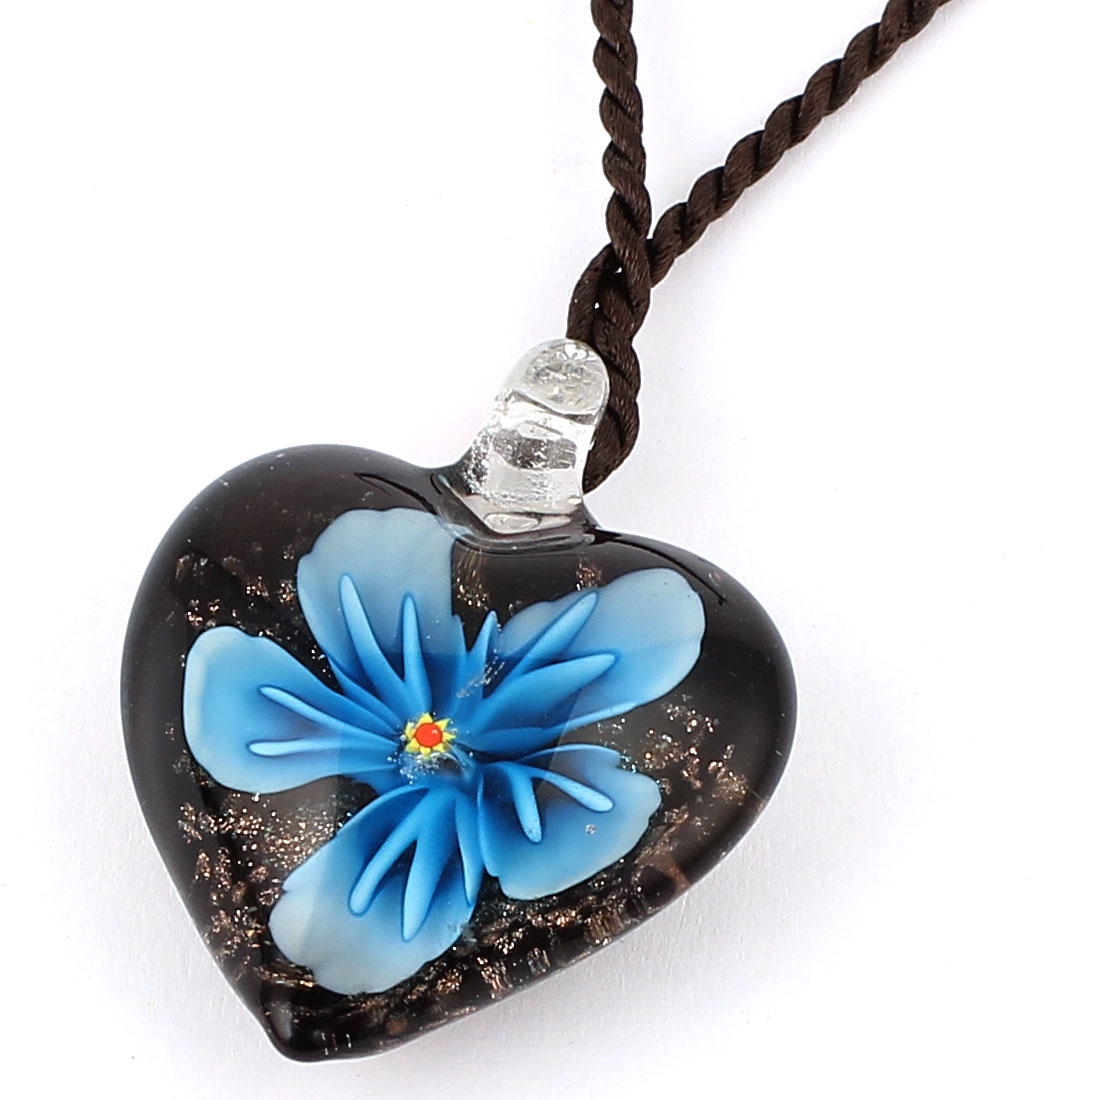 Shiny Heart Shape Glass Pressed Flower Pendant Necklace Neckwear Blue Black